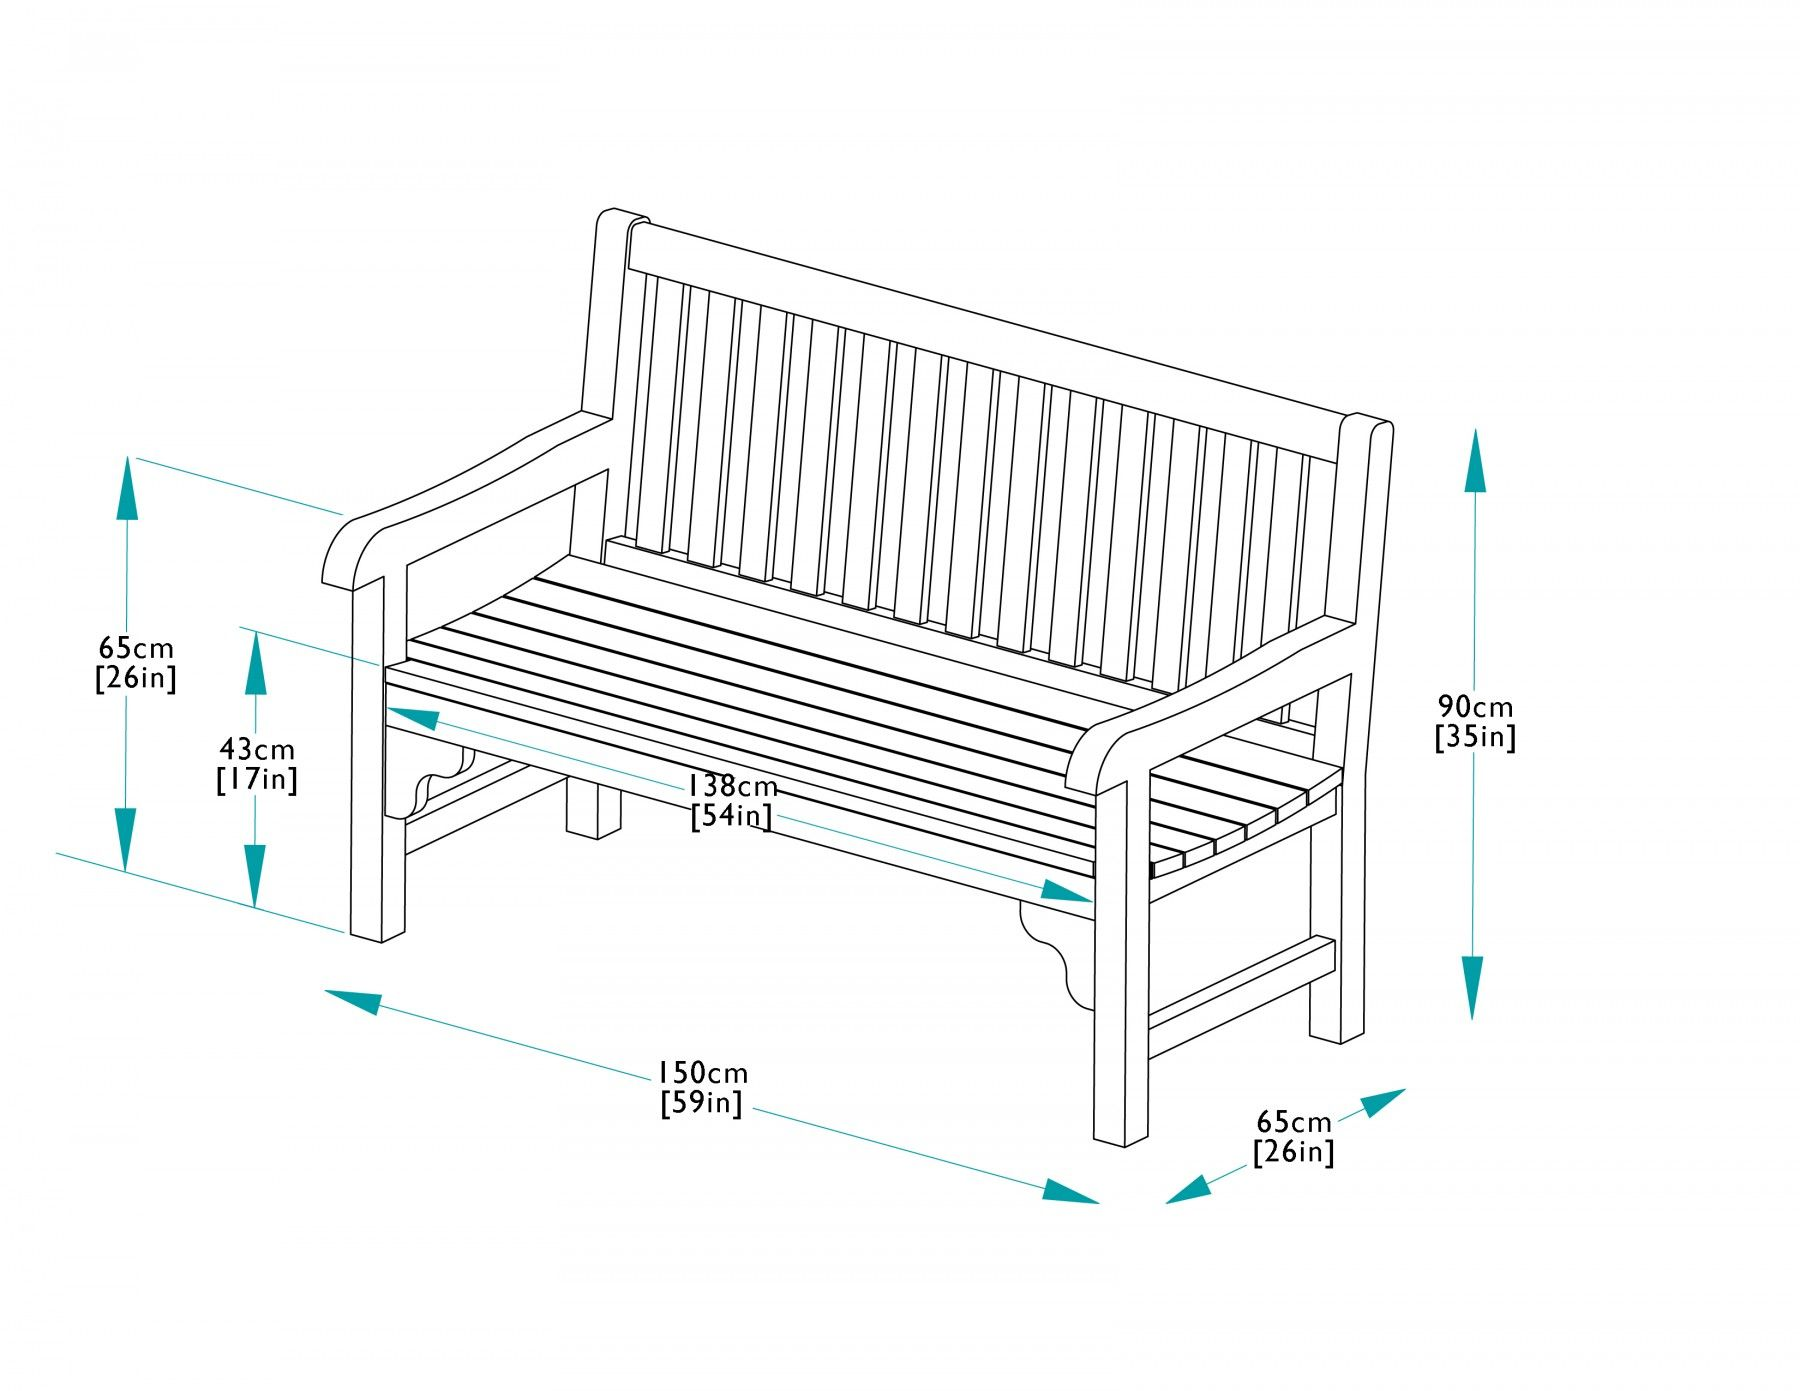 Park Bench Dimensions 150cm Teak Park Bench Bridgman Bench Cushions Indoor Patio Furniture Diy Furniture Plans